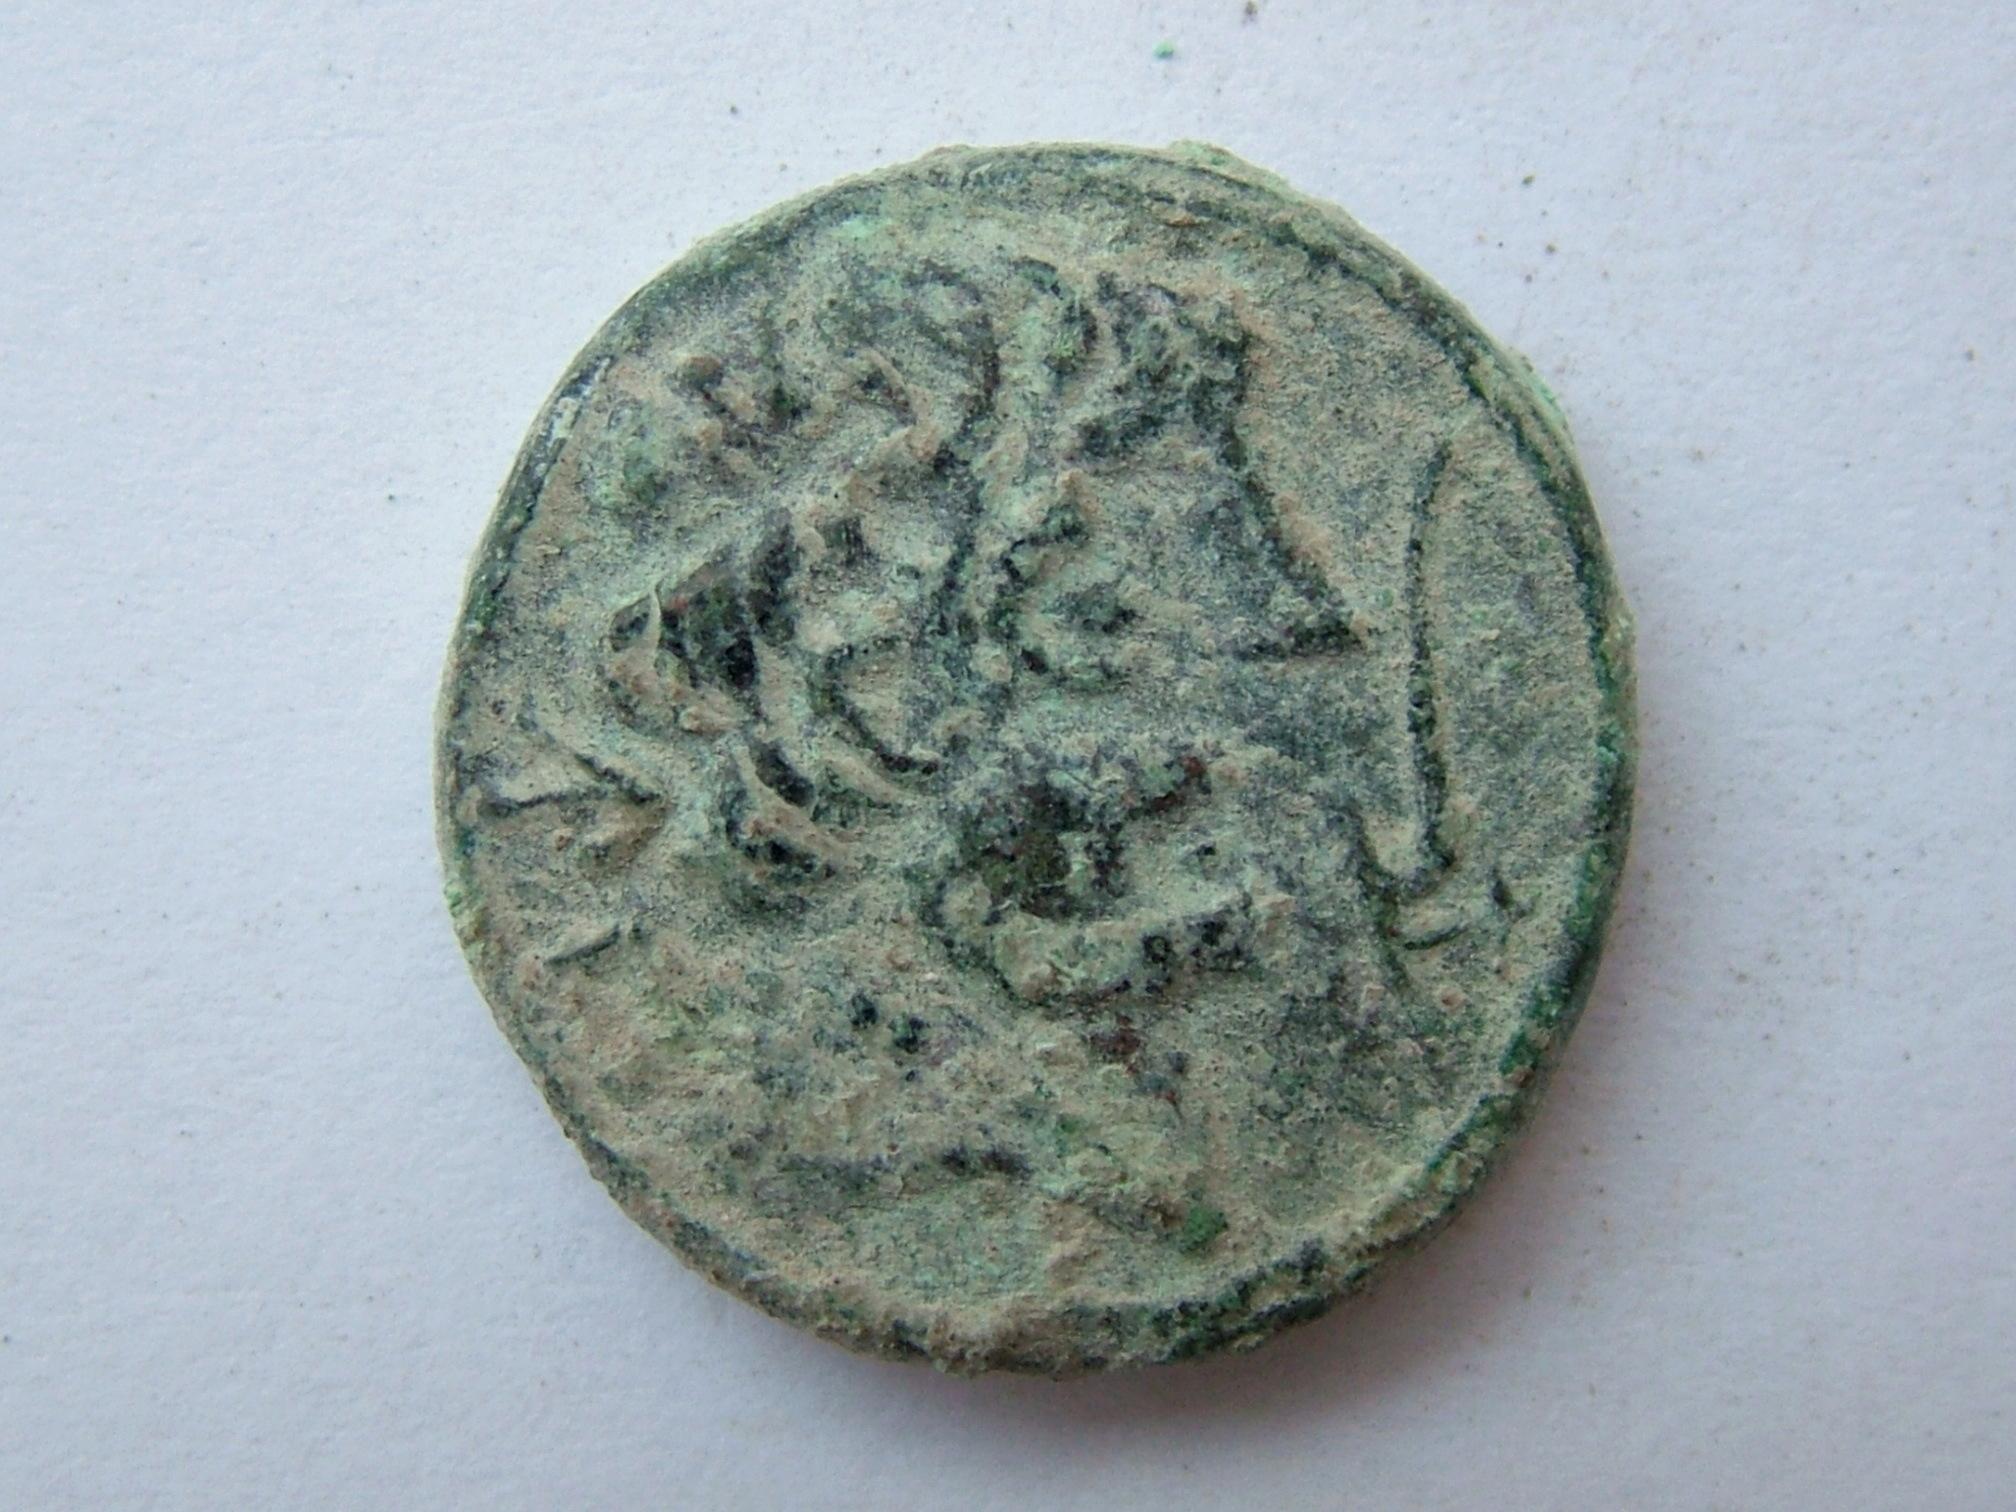 Imágenes a gran escala de pátinas y monedas falsas. Escalofriante (+18). 05_usa10